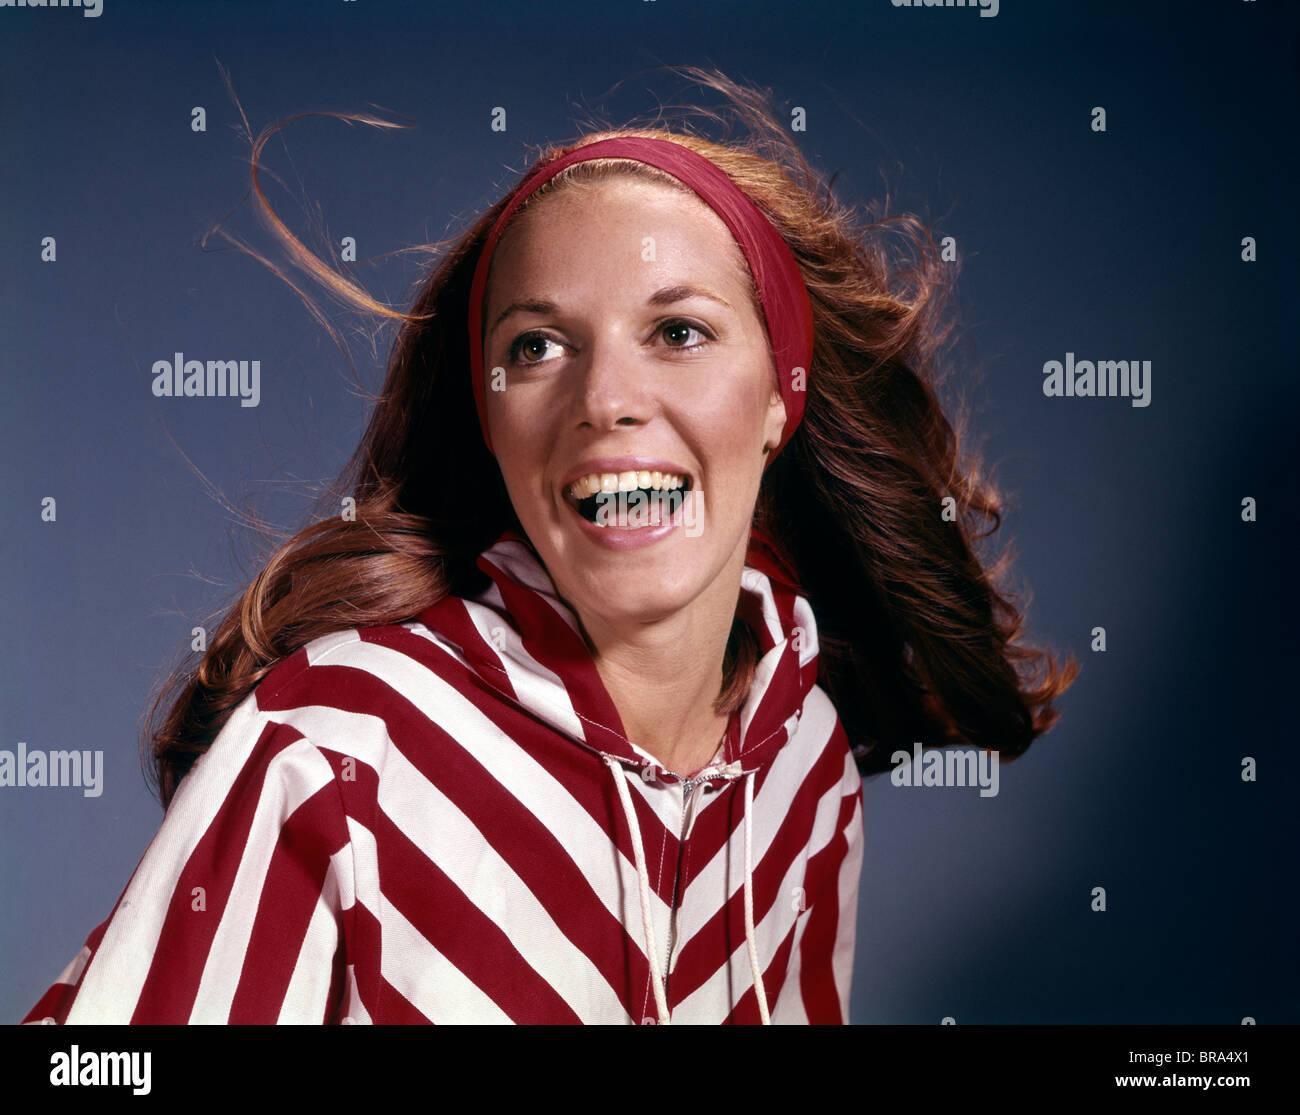 1960 Retrato sonriente riendo mujer chaqueta roja a rayas de diadema de moda retro Imagen De Stock